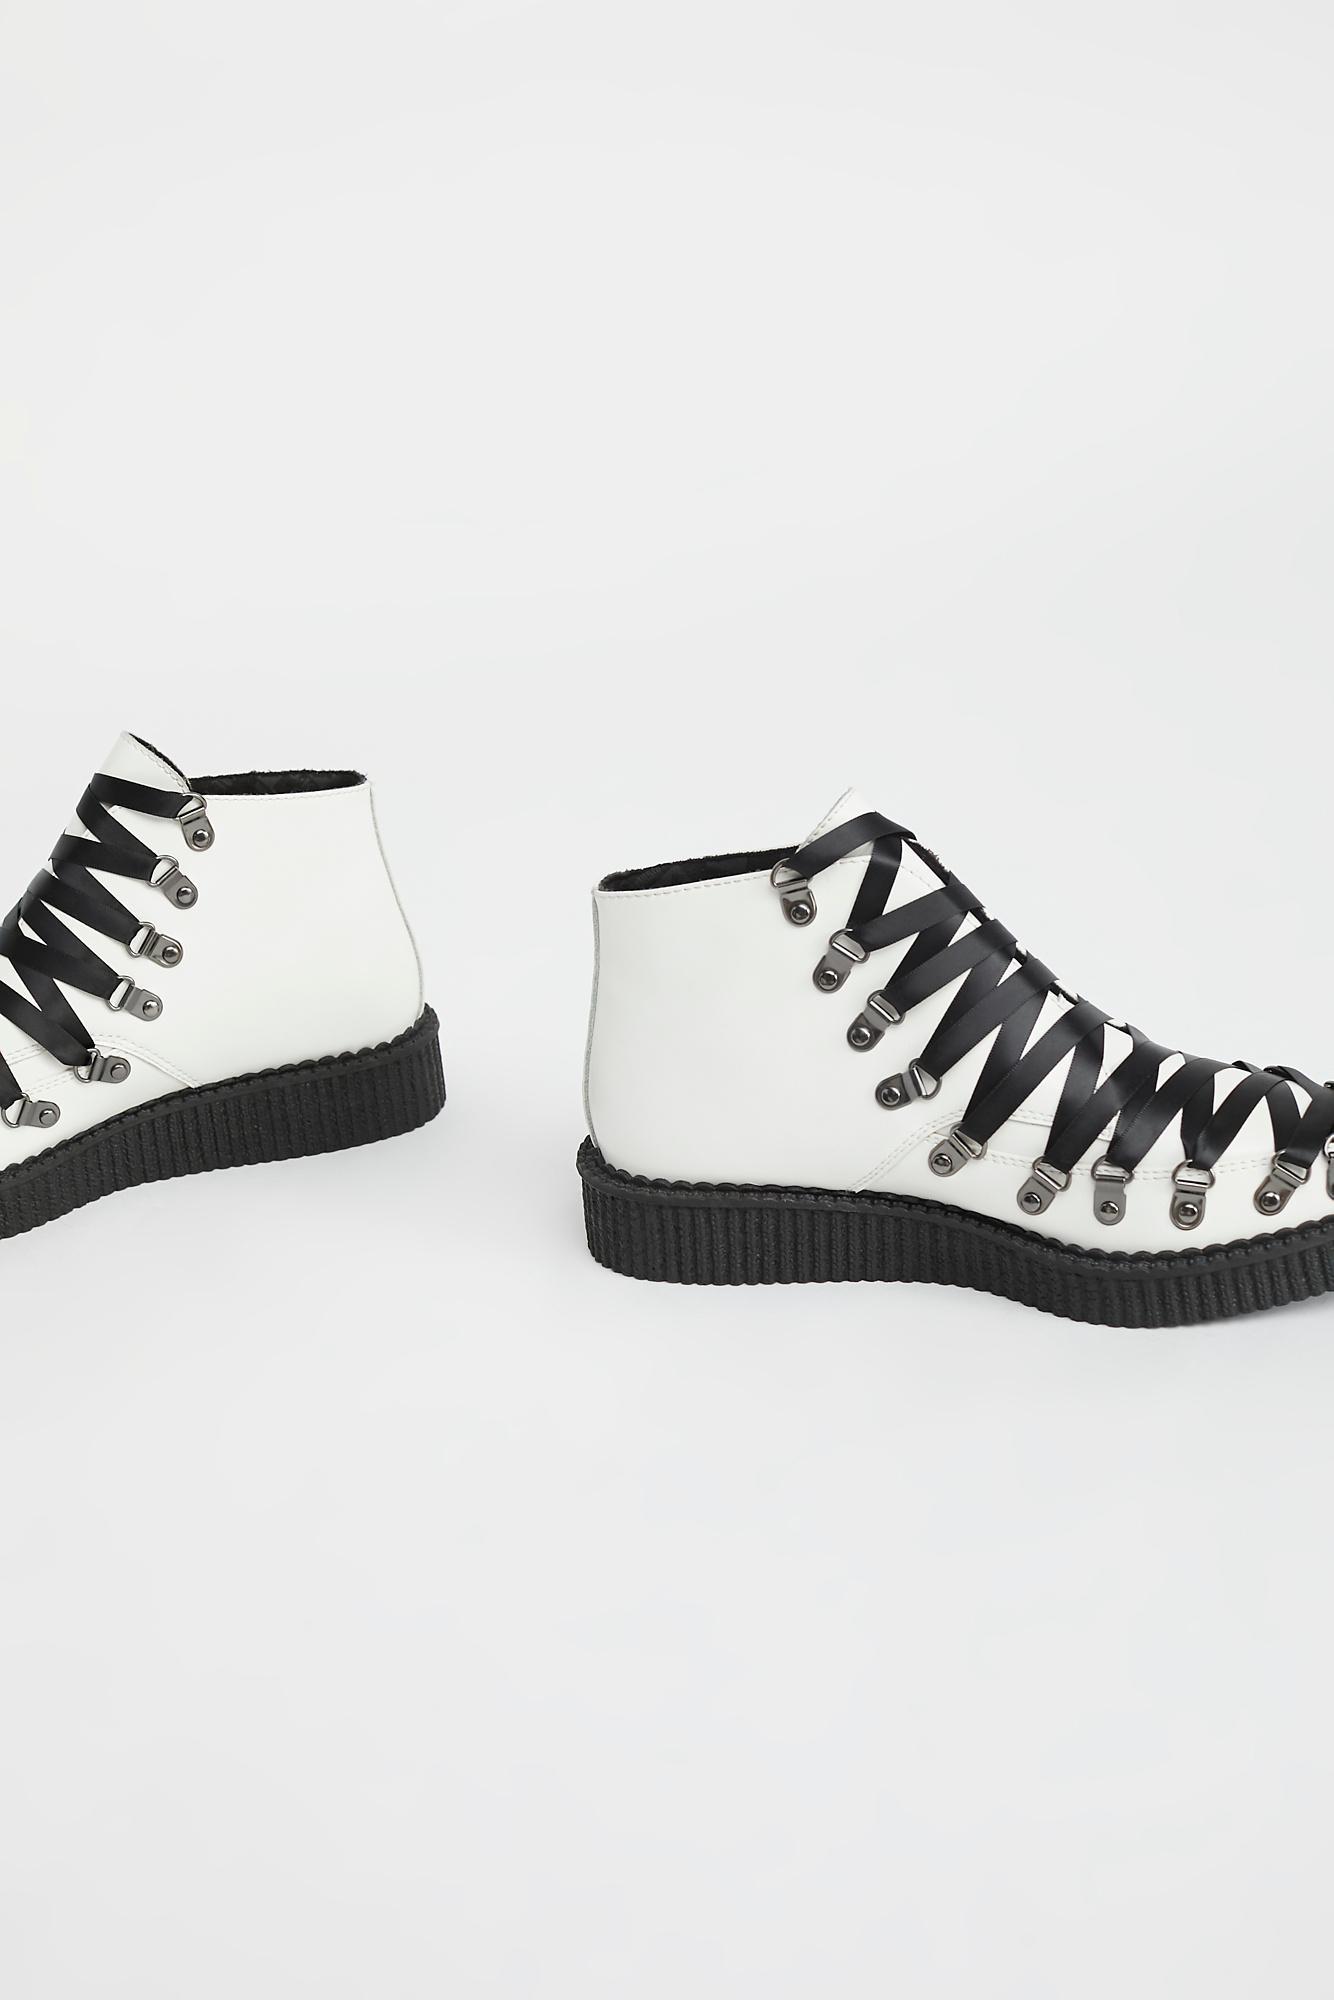 3c4d200eb2f Lyst - Free People T.u.k Corset Creeper Boot By T.u.k Footwear in White